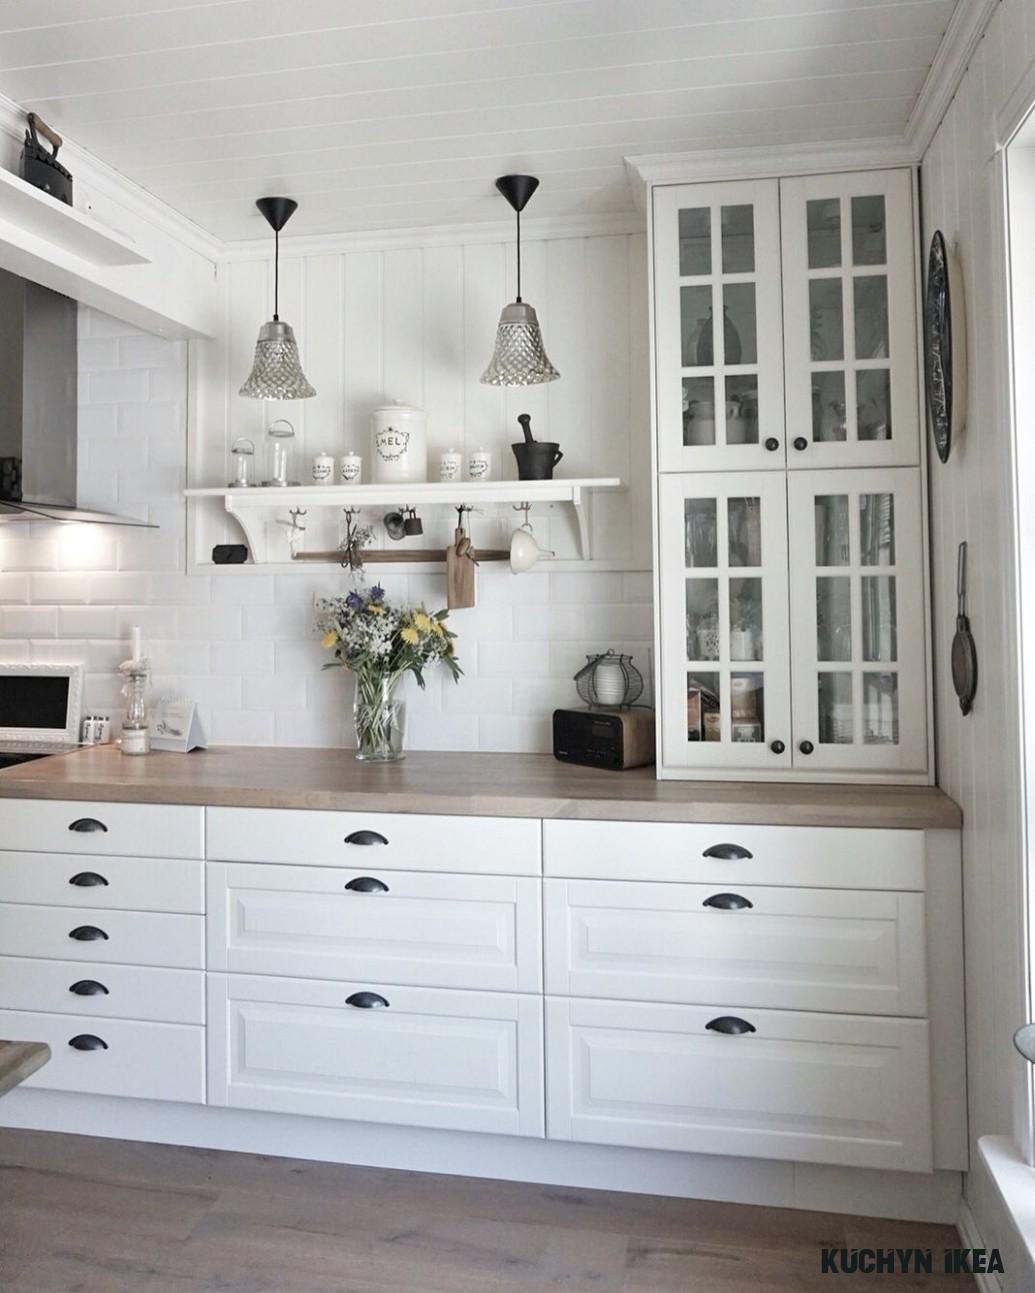 Pin by Teresa Gryga on House ideas  Ikea kitchen design, Kitchen